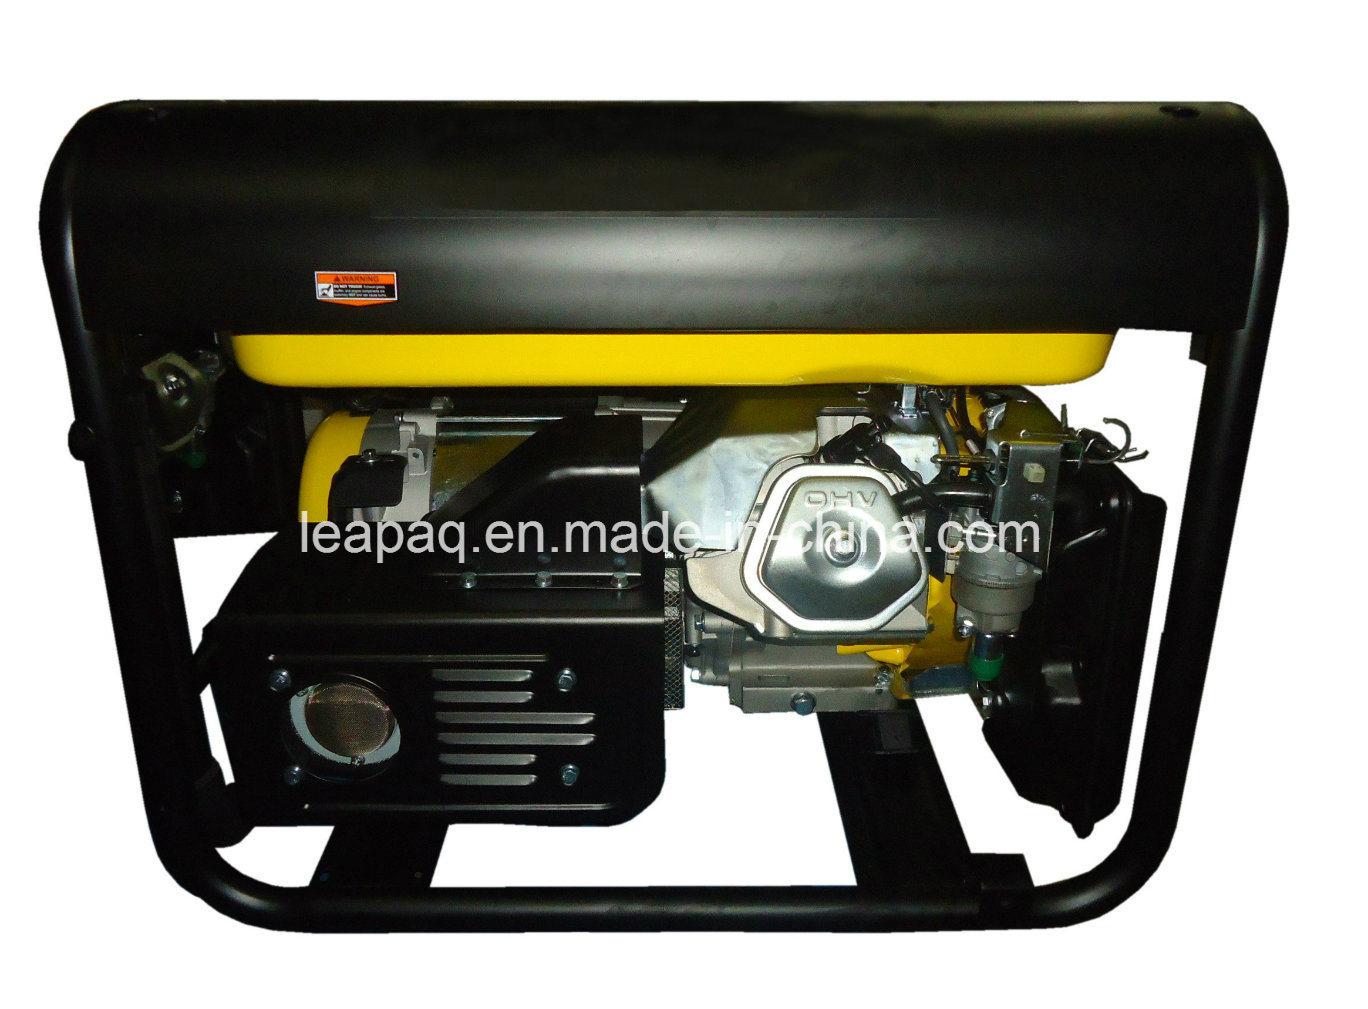 2.8kw Wheels & Handle P-Type Portable Gasoline Generator